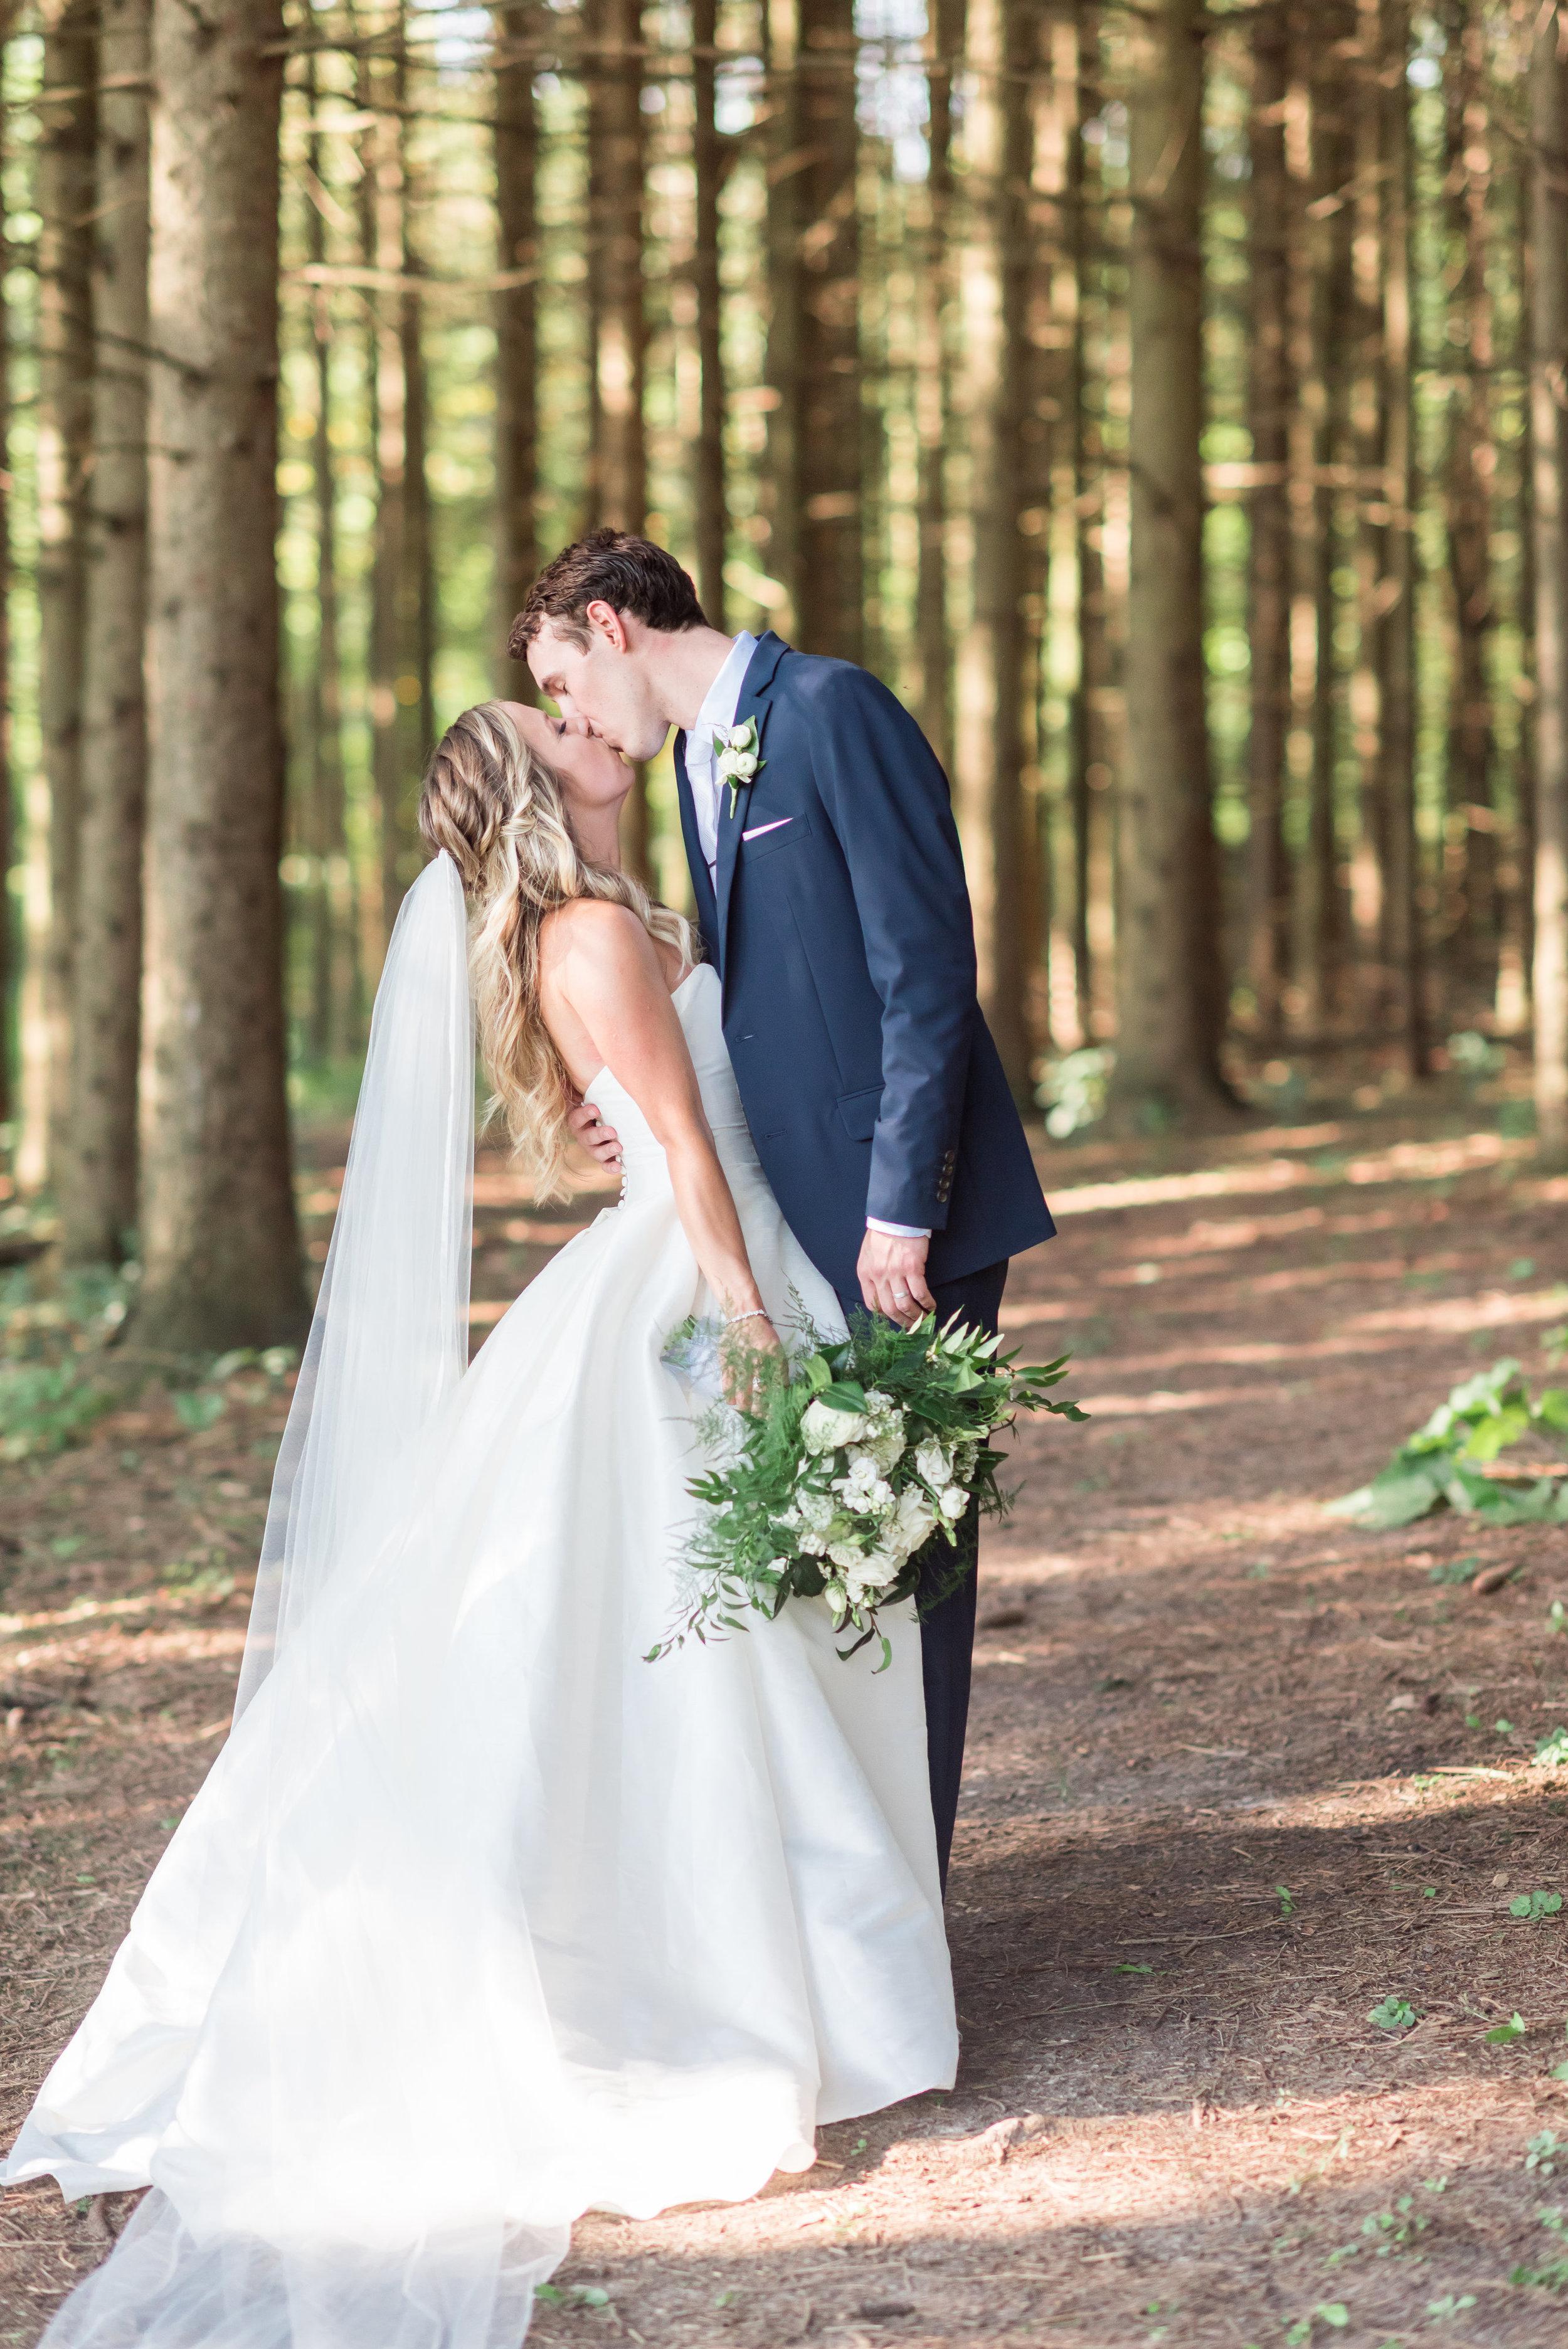 The Dugenske Wedding 9 15 18-0653.jpg